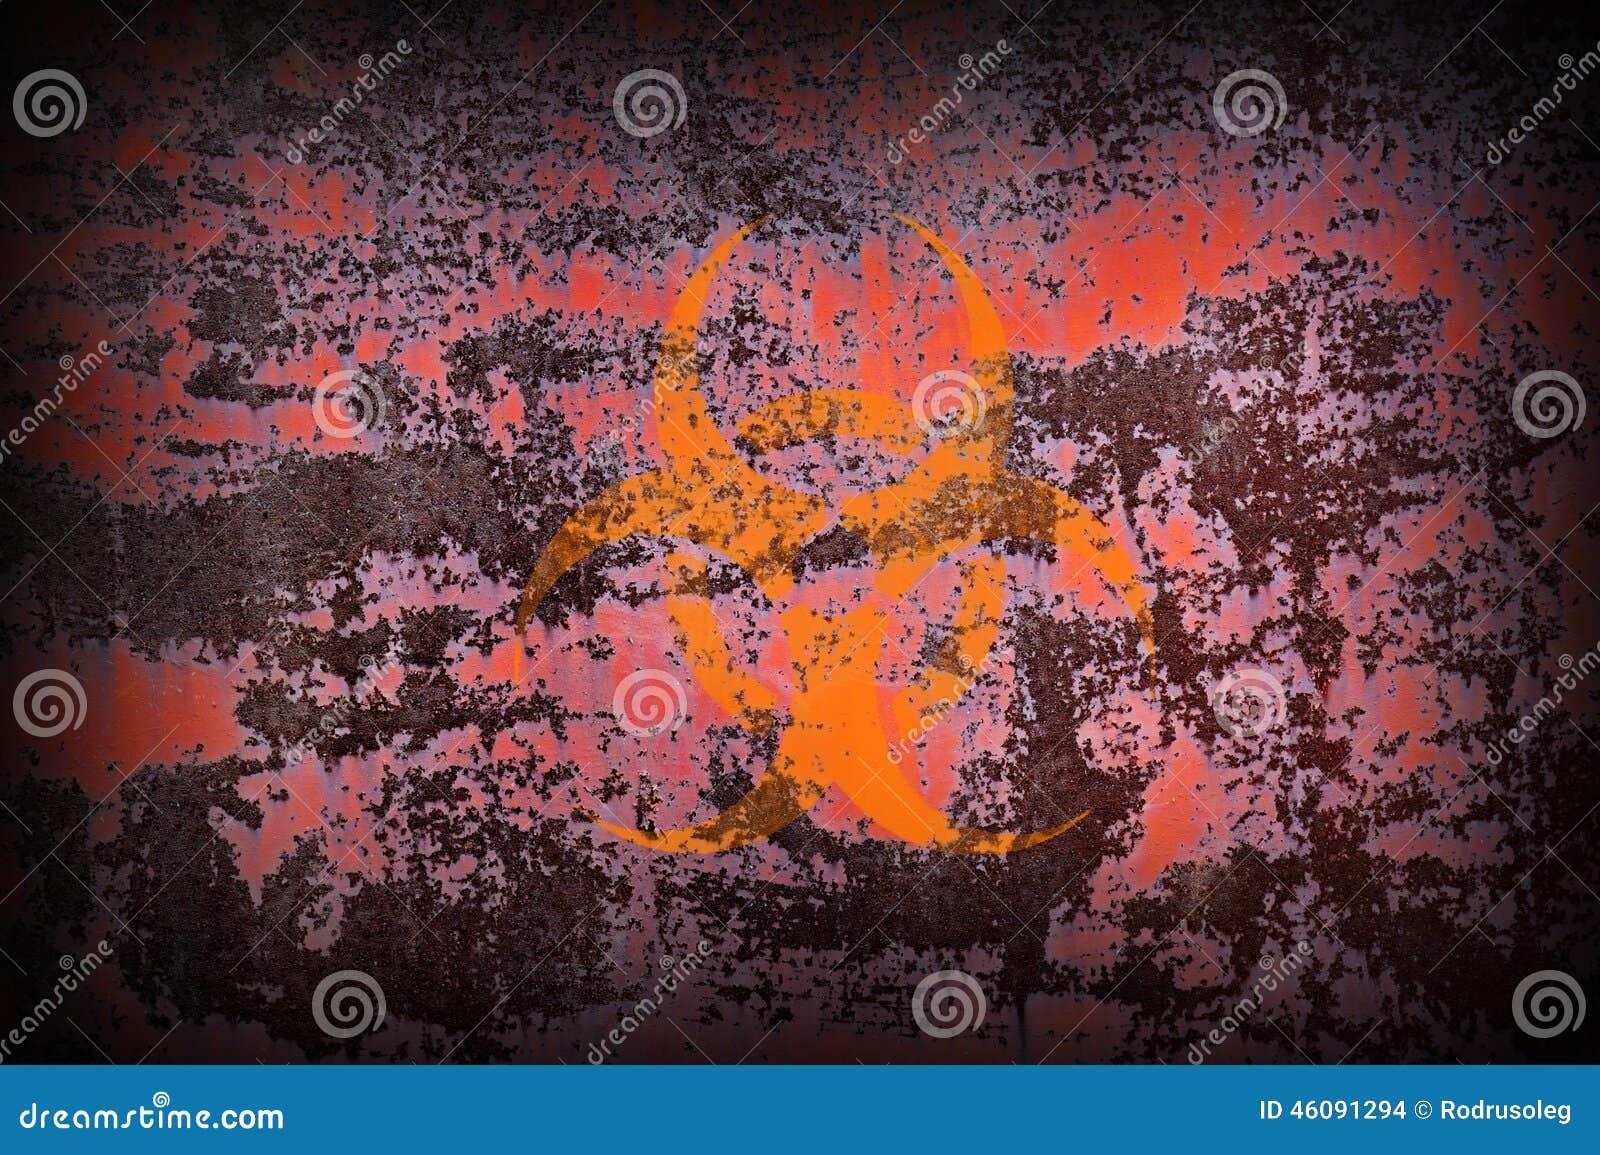 Biohazard Symbol on Old Rusty Metal Surface.